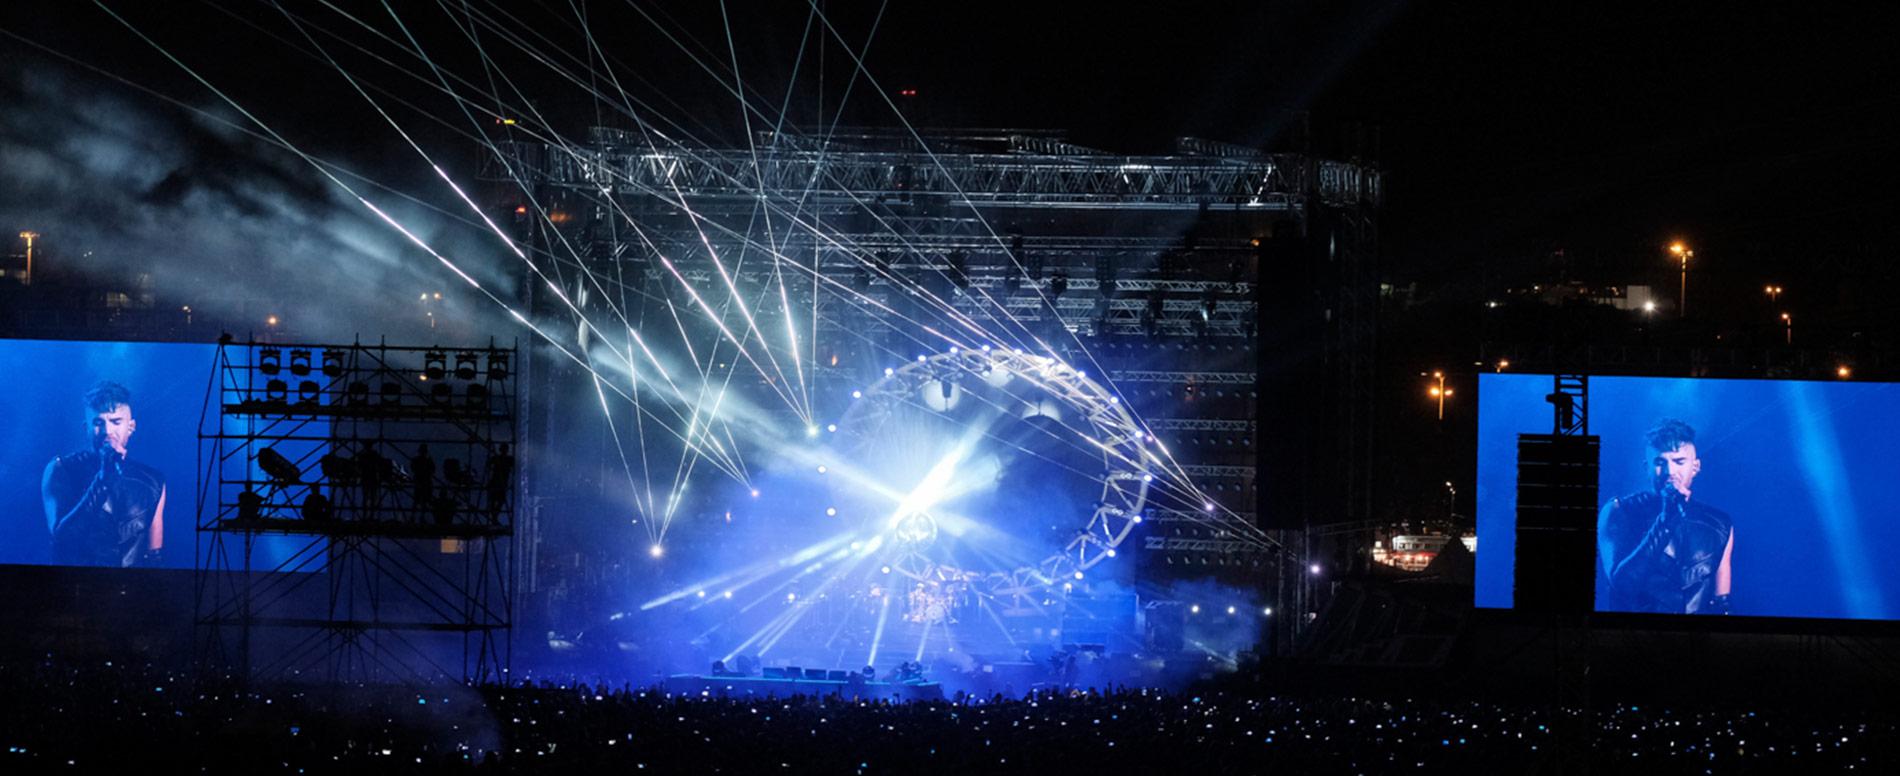 lighting-show